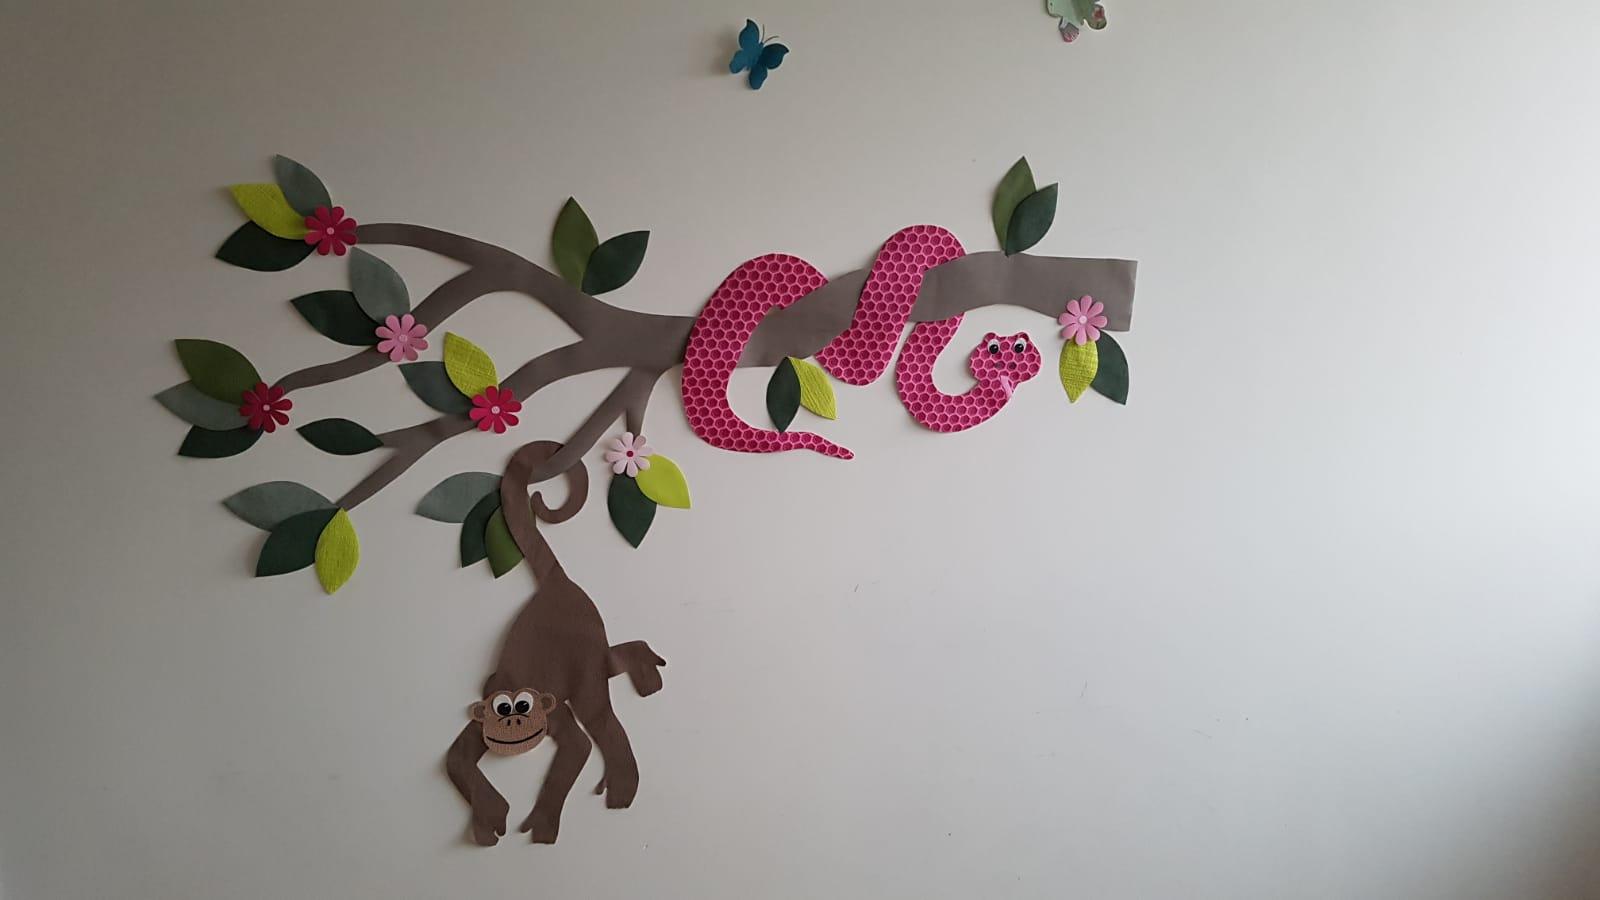 Babykamer In Hoek : Slangentak vanuit hoek komend u uiltje boompje beestje